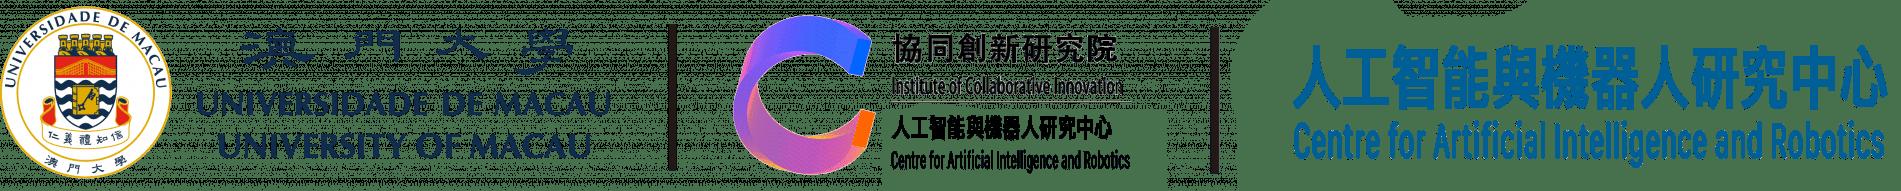 University of Macau | Centre for Artificial Intelligence and Robotics Logo